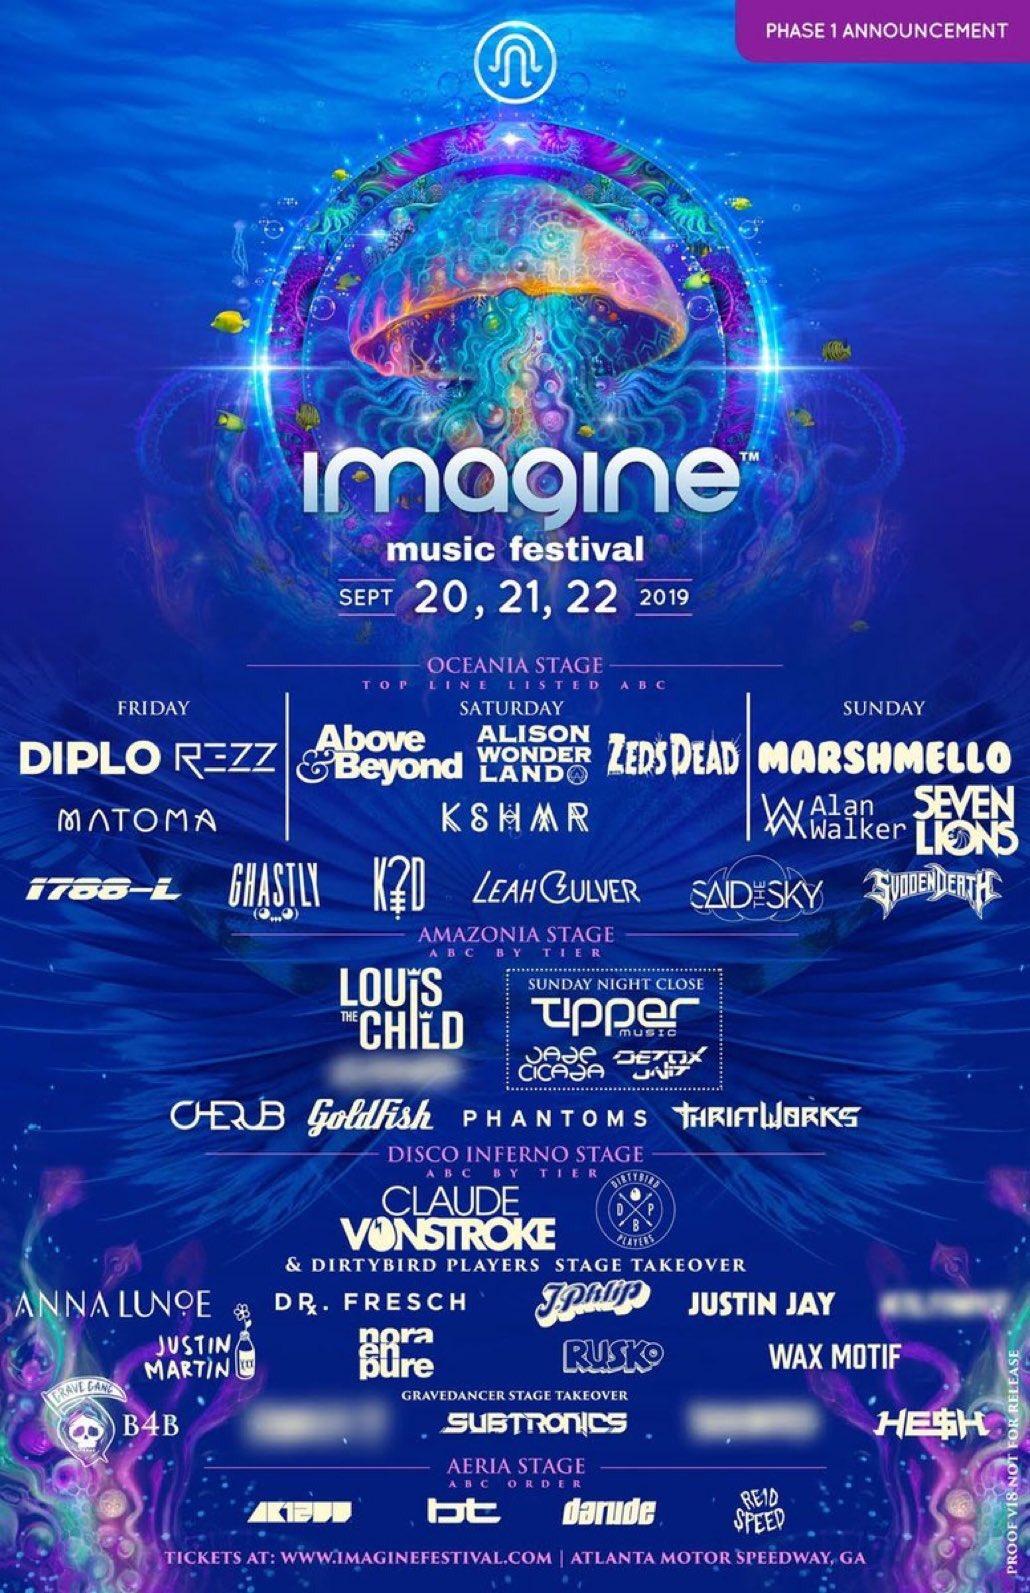 Imagine Music Festival 2019 Phase 1 Lineup